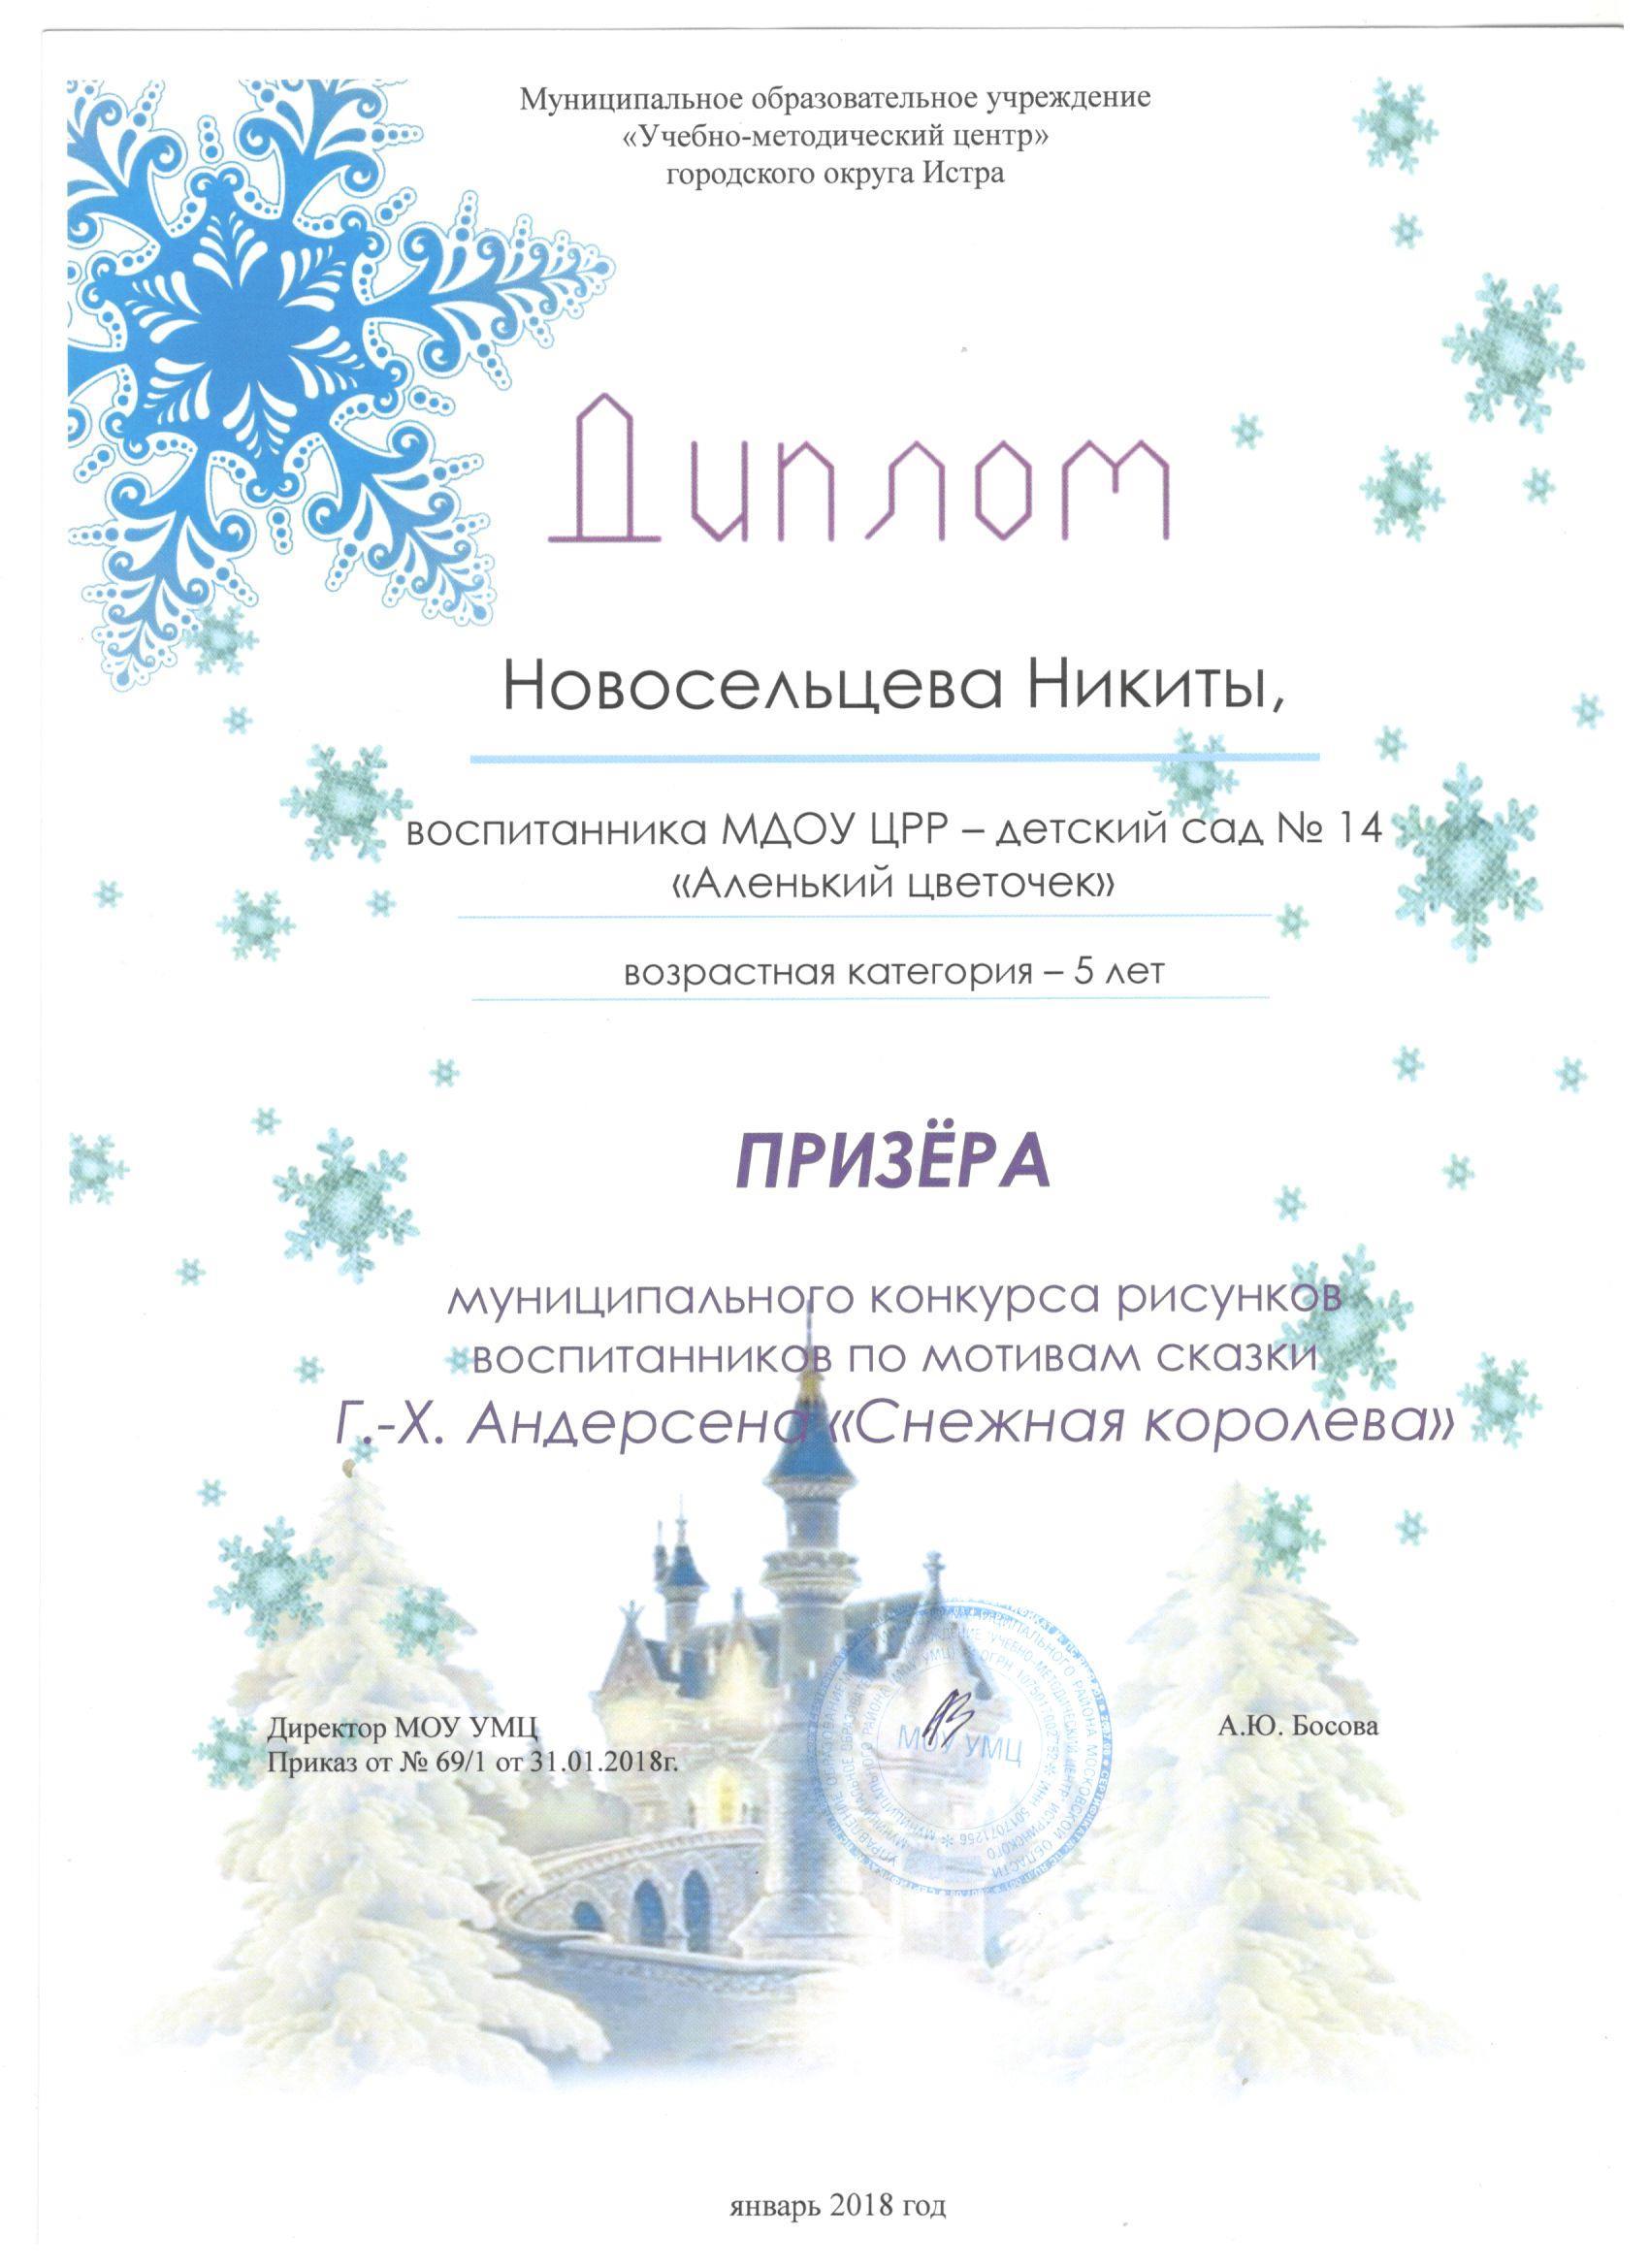 Снежная королева Новосельцев никита УМЦ.